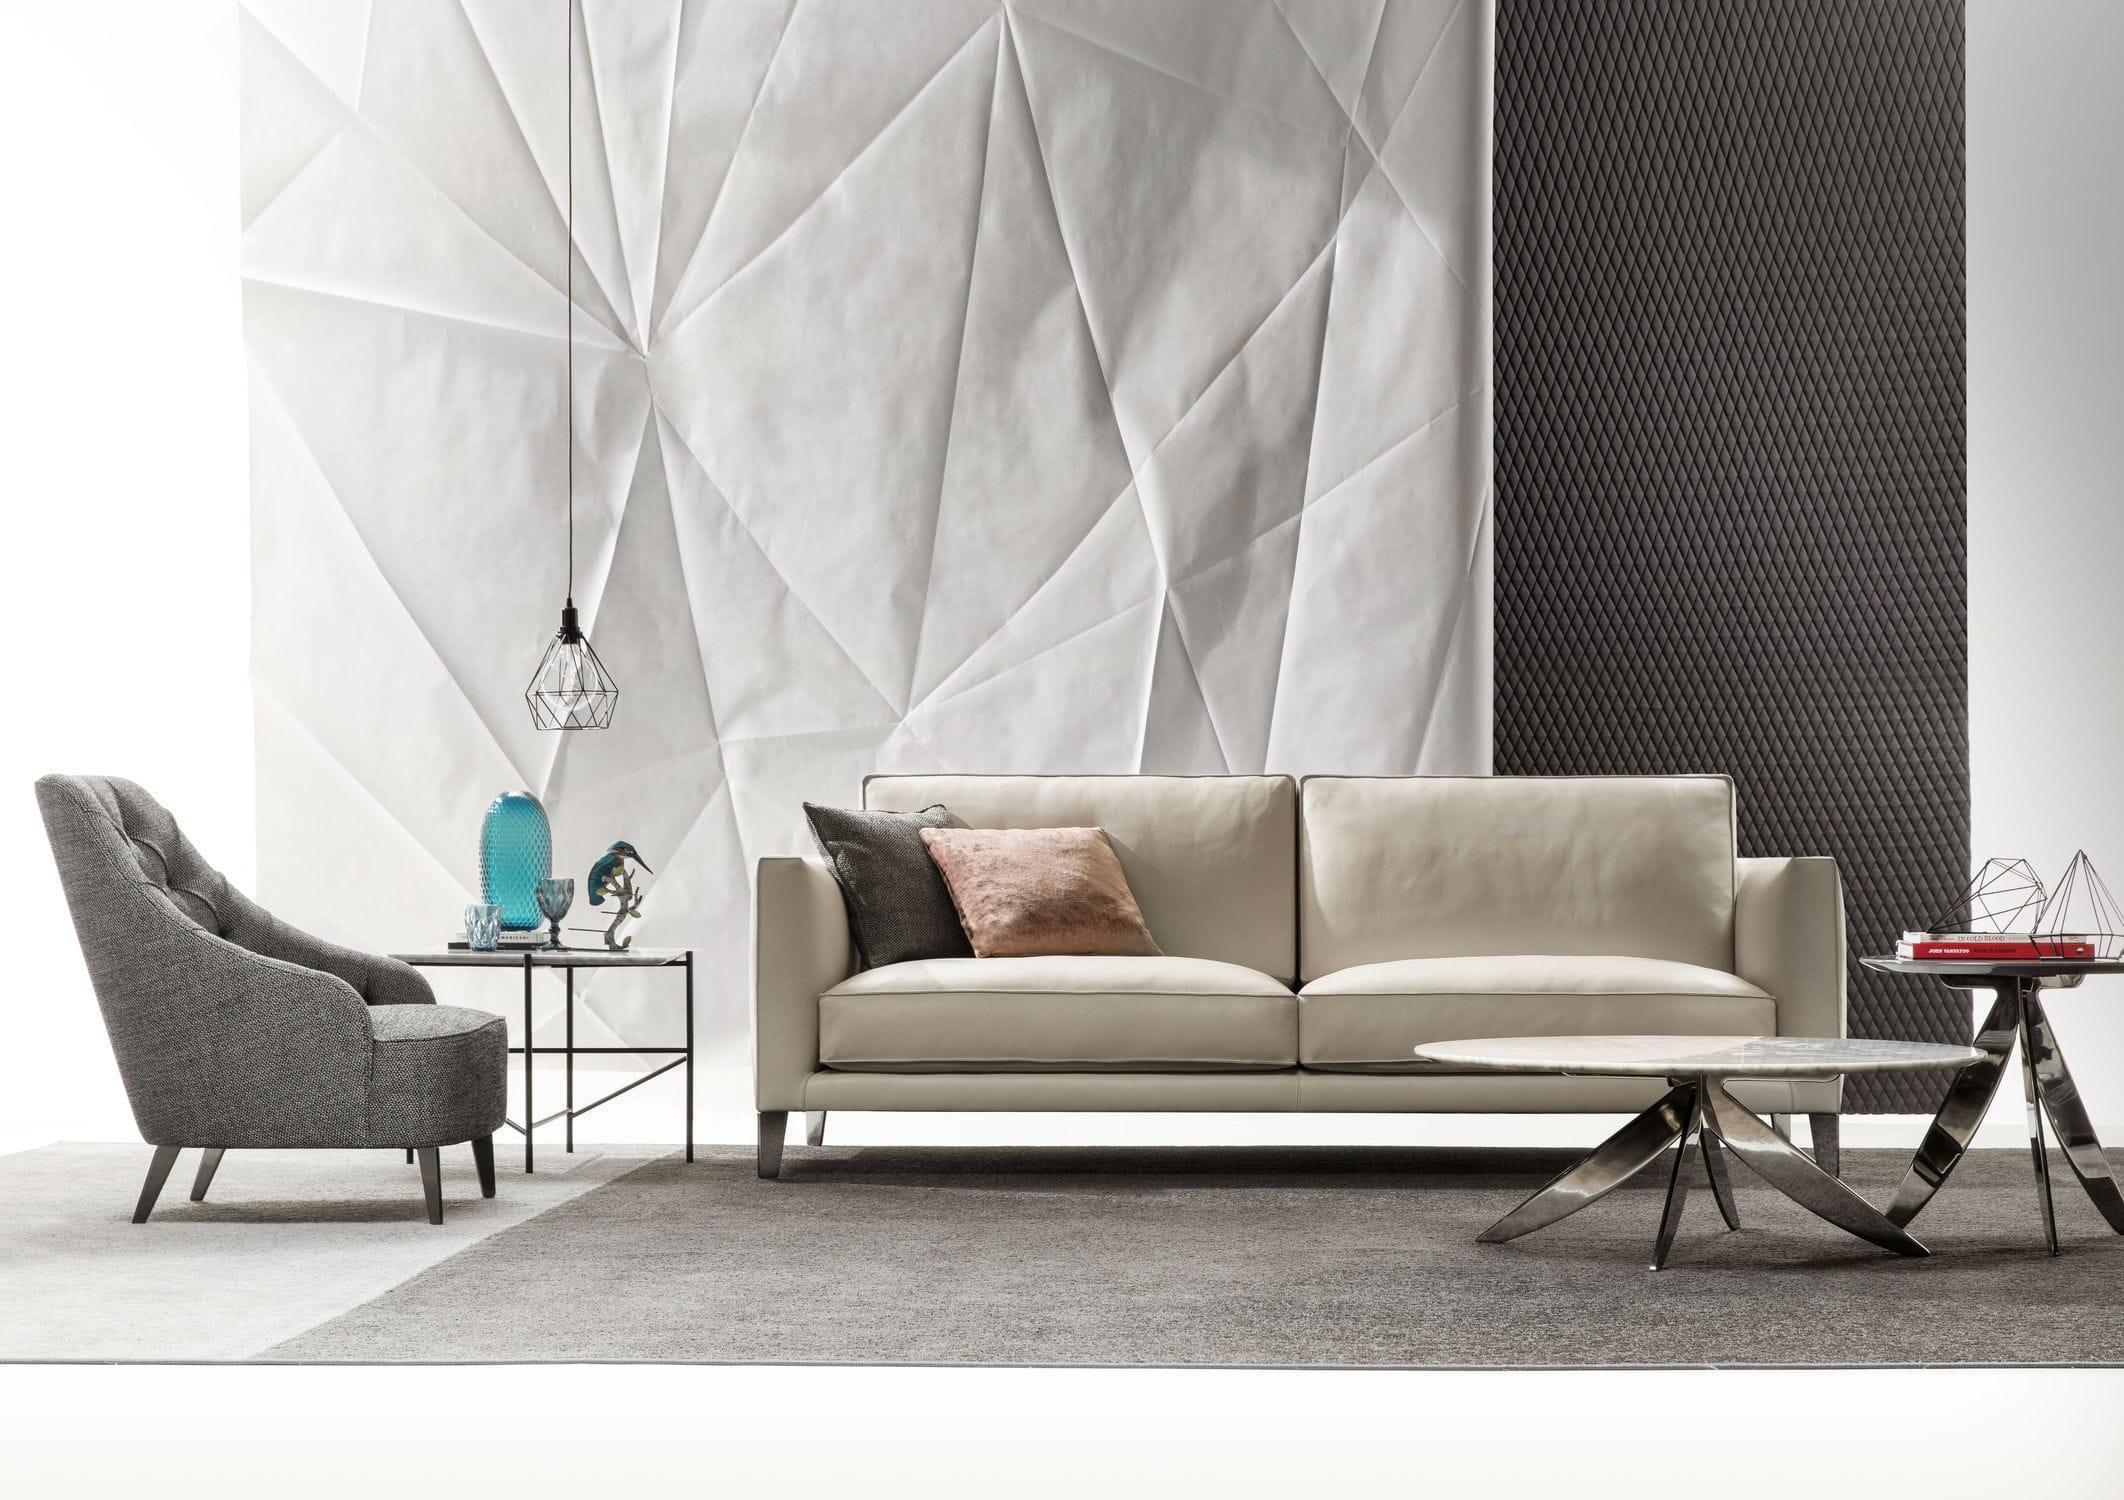 Full Size of Modulares Sofa Mit Abnehmbarem Bezug Abnehmbarer Ikea Big Abnehmbaren Sofas Grau Hussen Abnehmbar Waschbar Waschbarer Modernes Leder 4 Pltze Time Sitzhöhe 55 Sofa Sofa Abnehmbarer Bezug